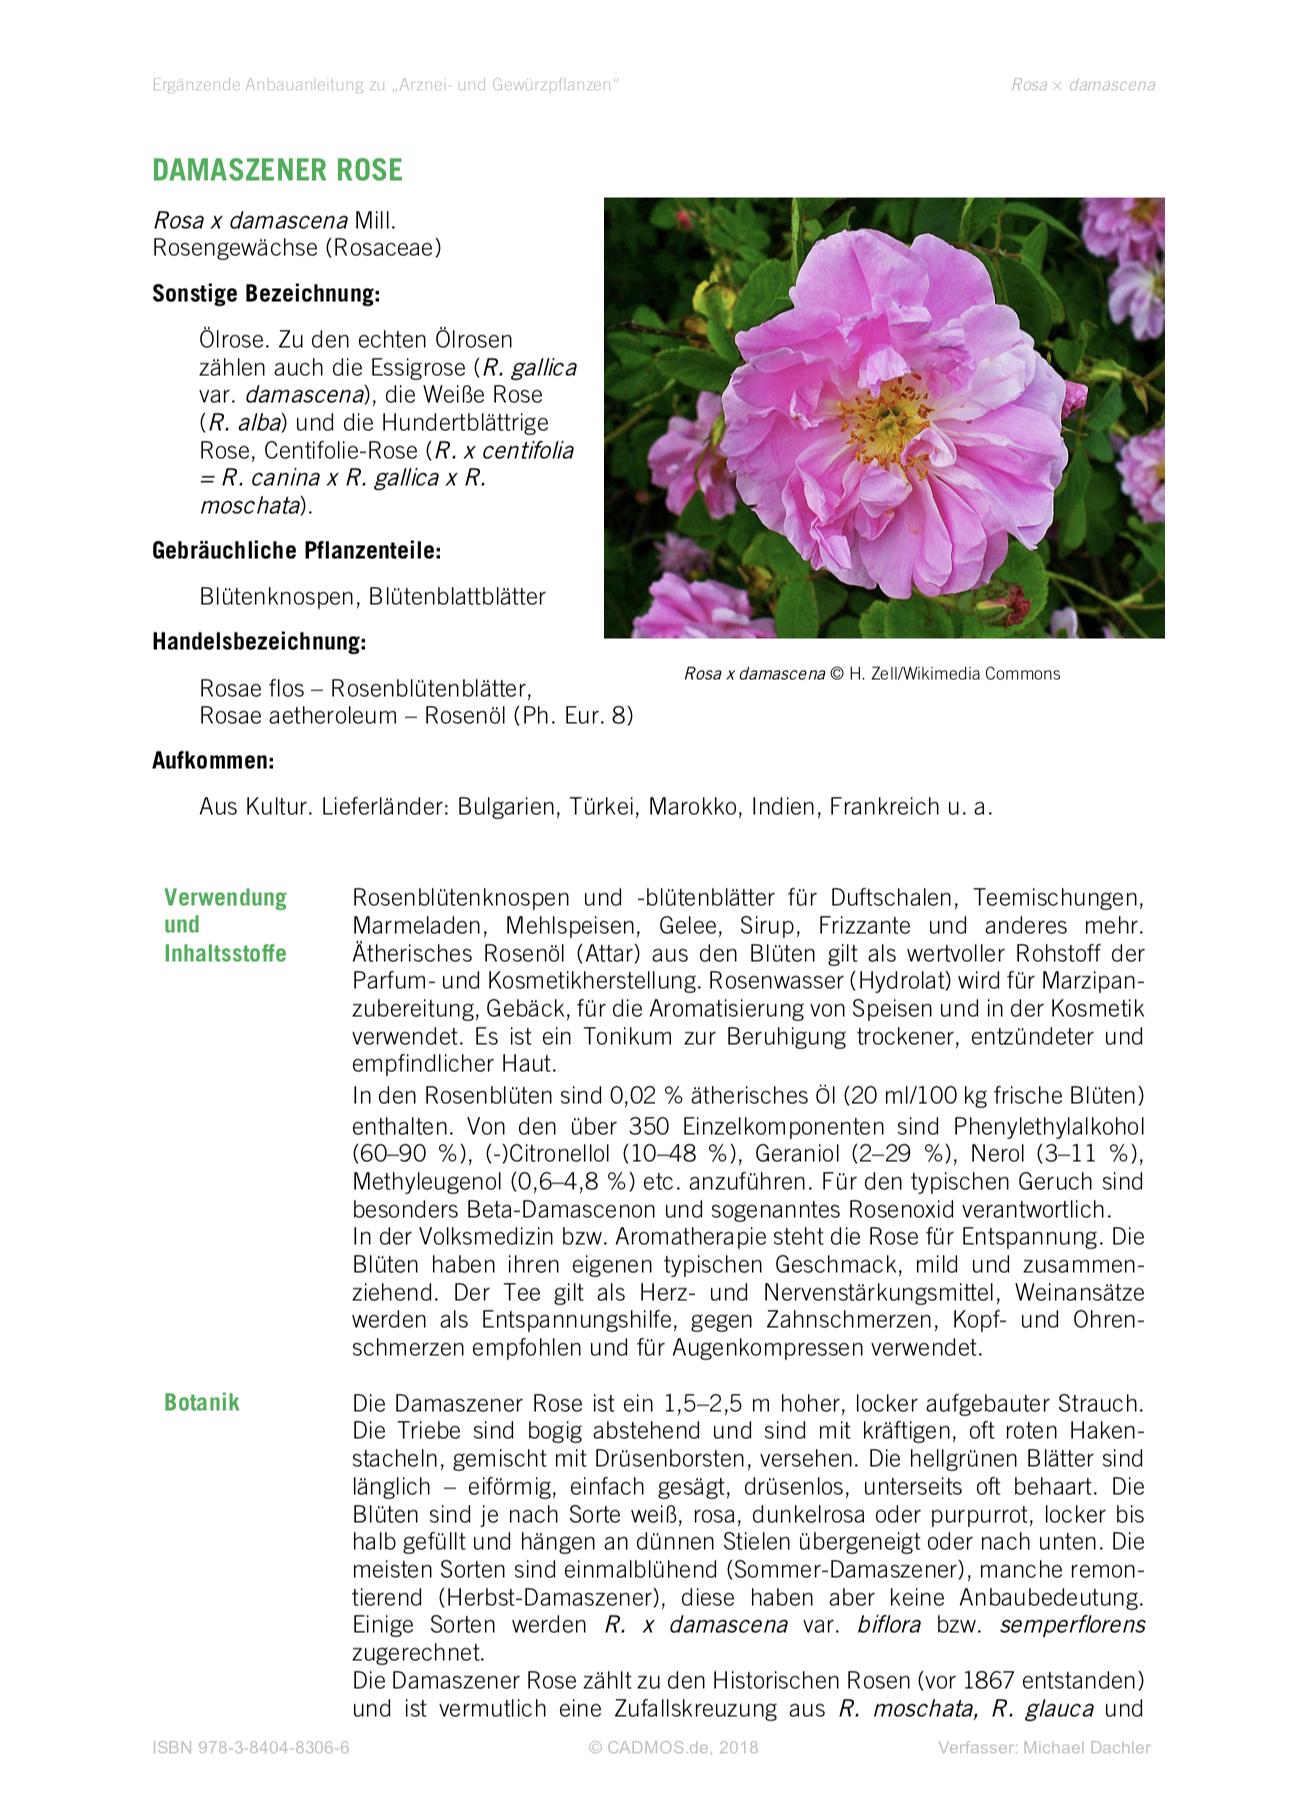 Anbauanleitung Damastener-Rose (Rosa x damascena)